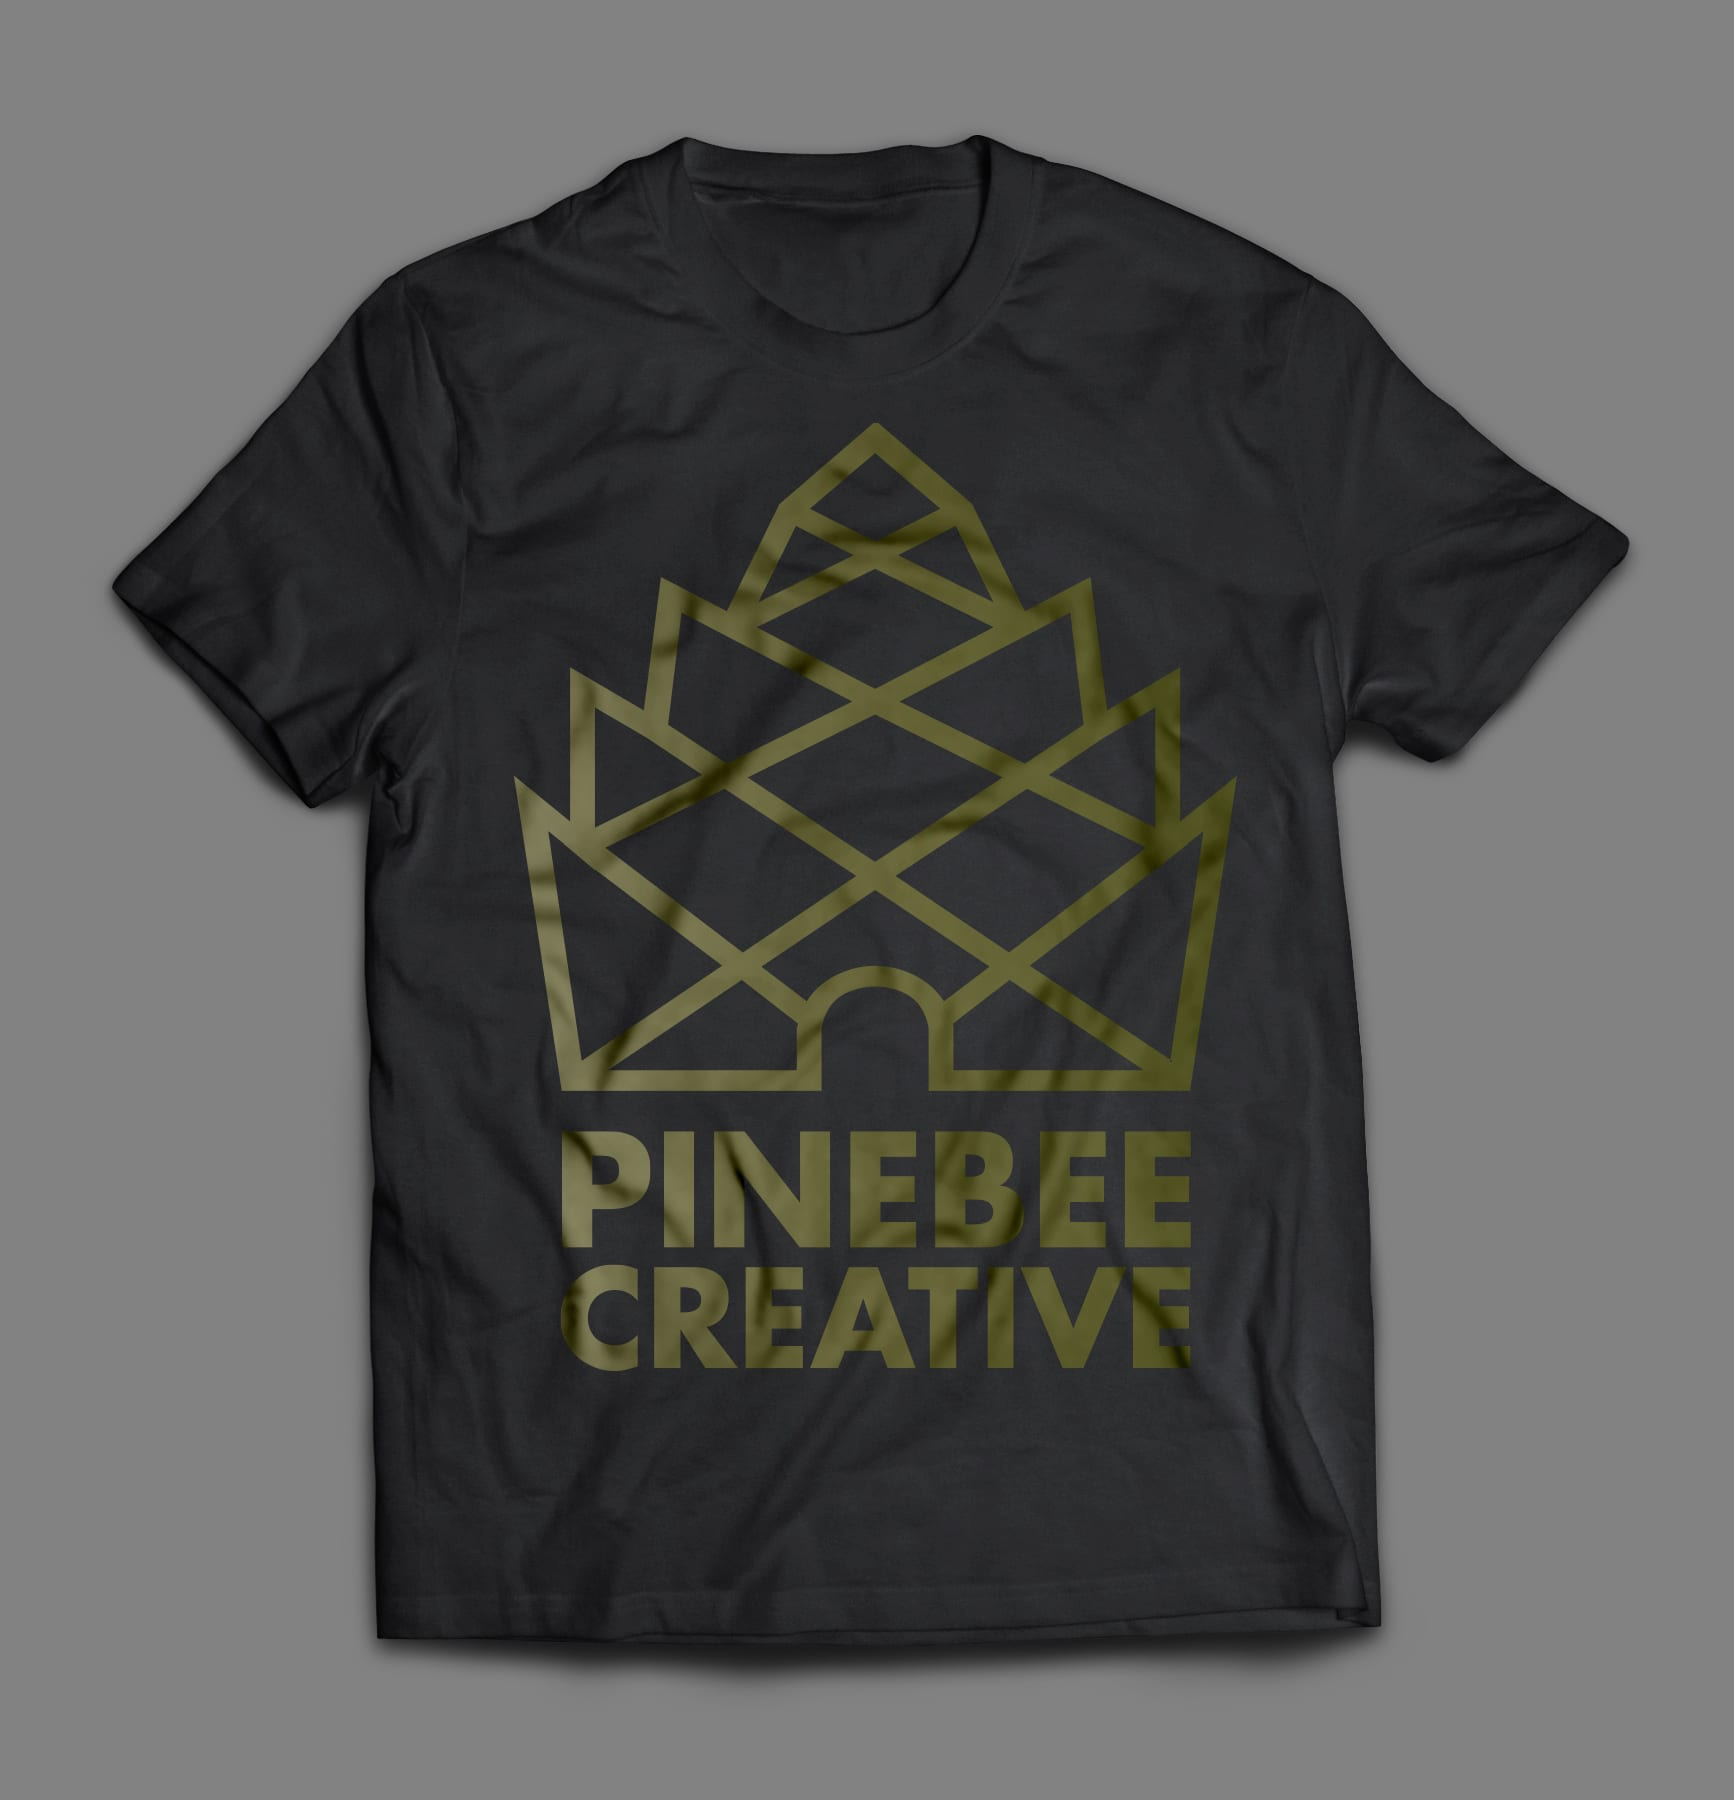 Promotional Shirt with Pinebee Creative Logo